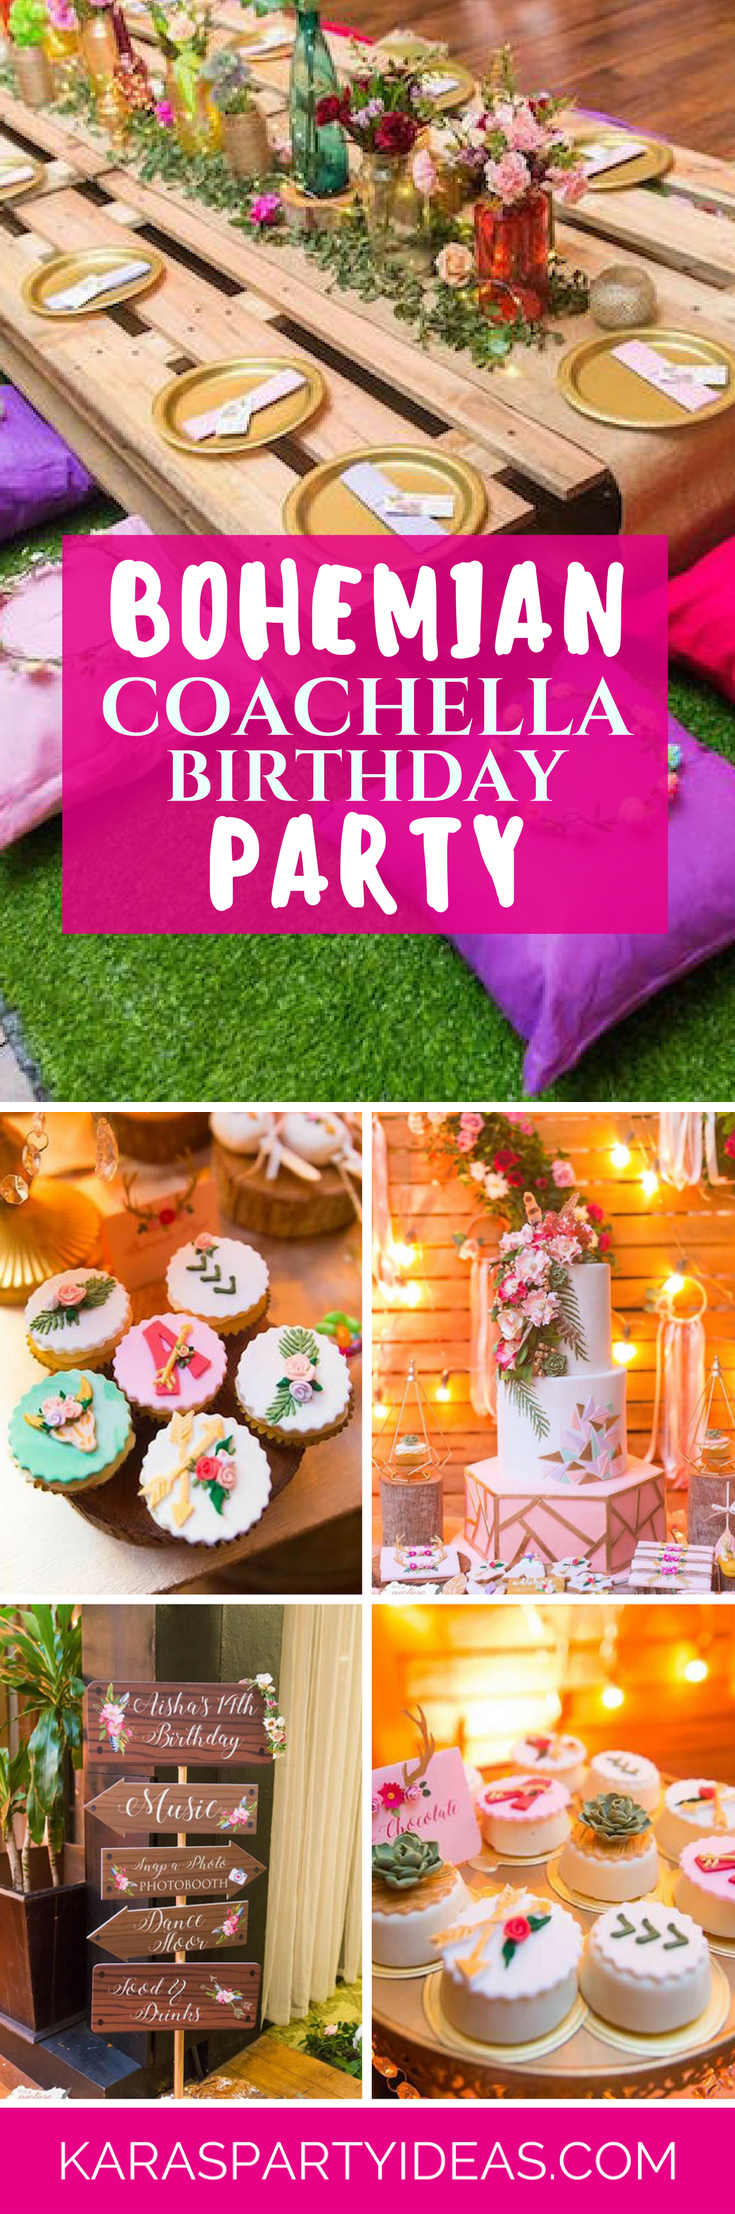 Tea time tea birthday party via kara s party ideas karaspartyideas com - Bohemian Coachella Birthday Party Via Kara S Party Ideas Karaspartyideas Com